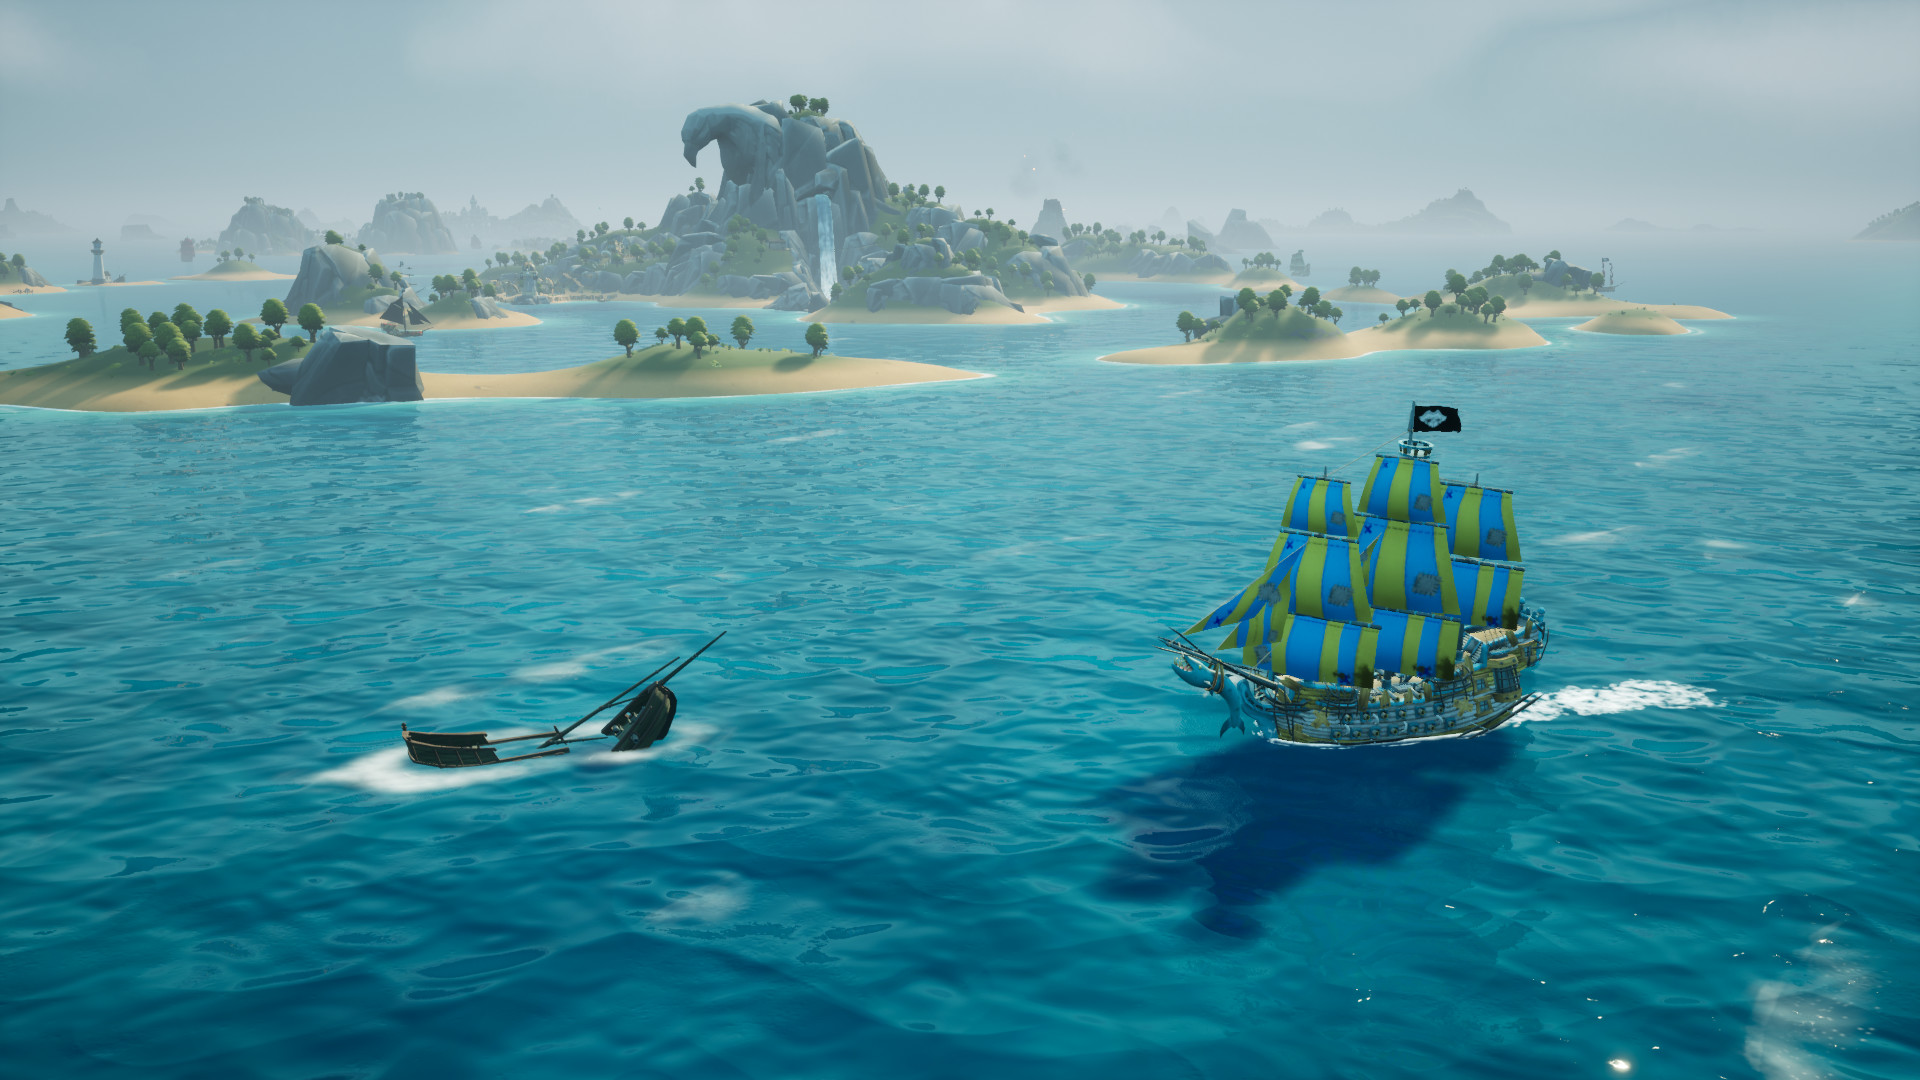 king of seas ships